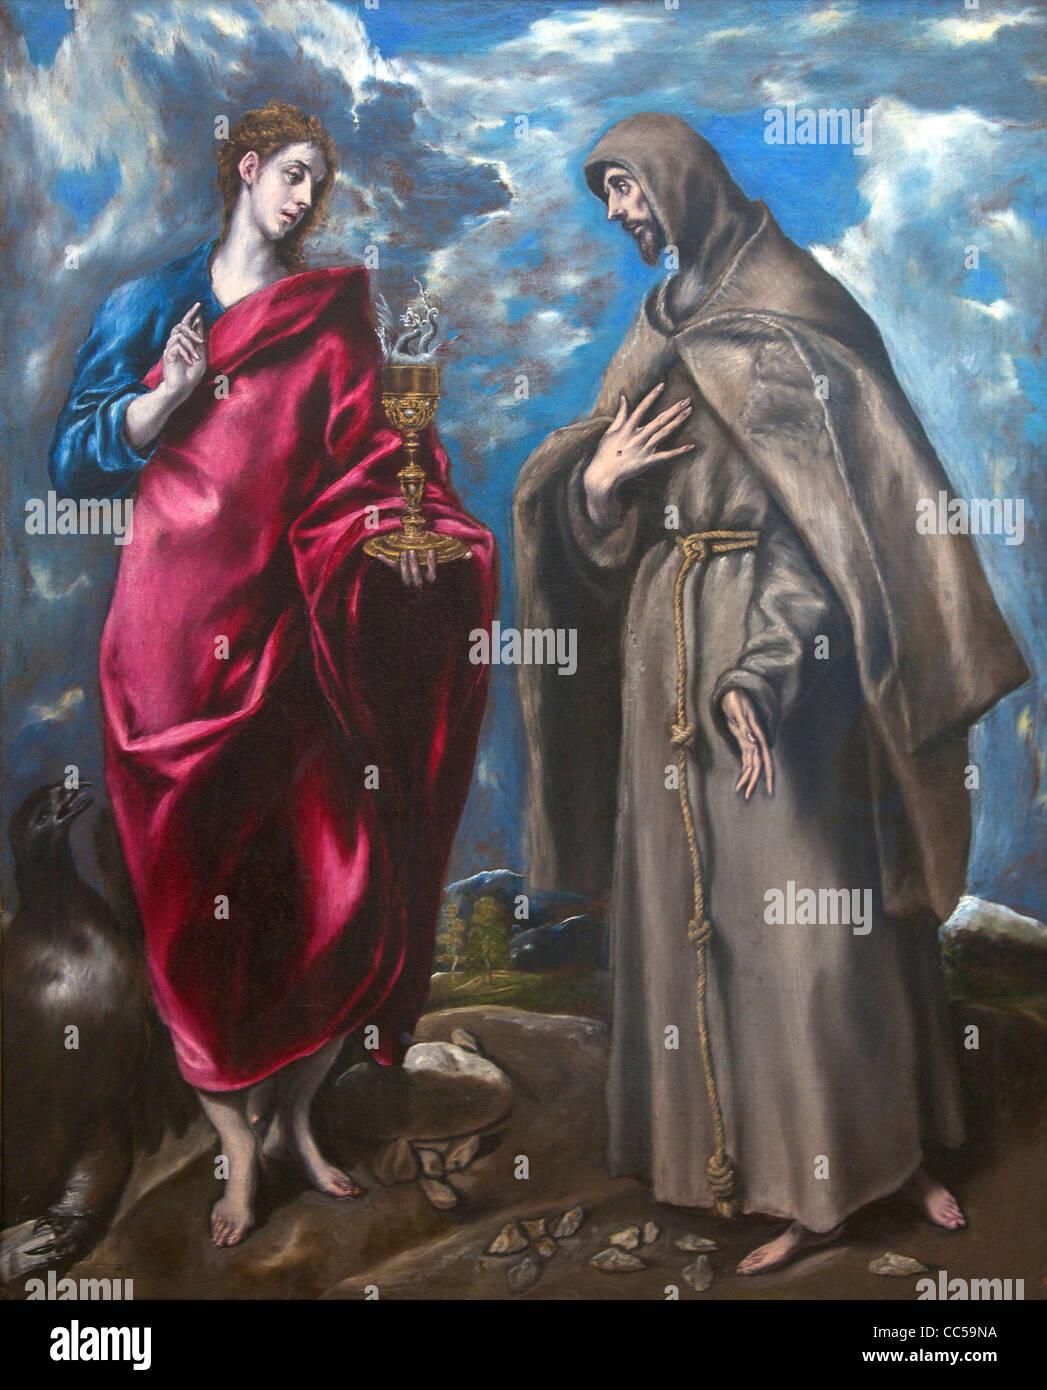 Saint John the Evangelist and Francis, by El Greco, Uffizi Gallery, Florence, Tuscany, Italy, Europe - Stock Image